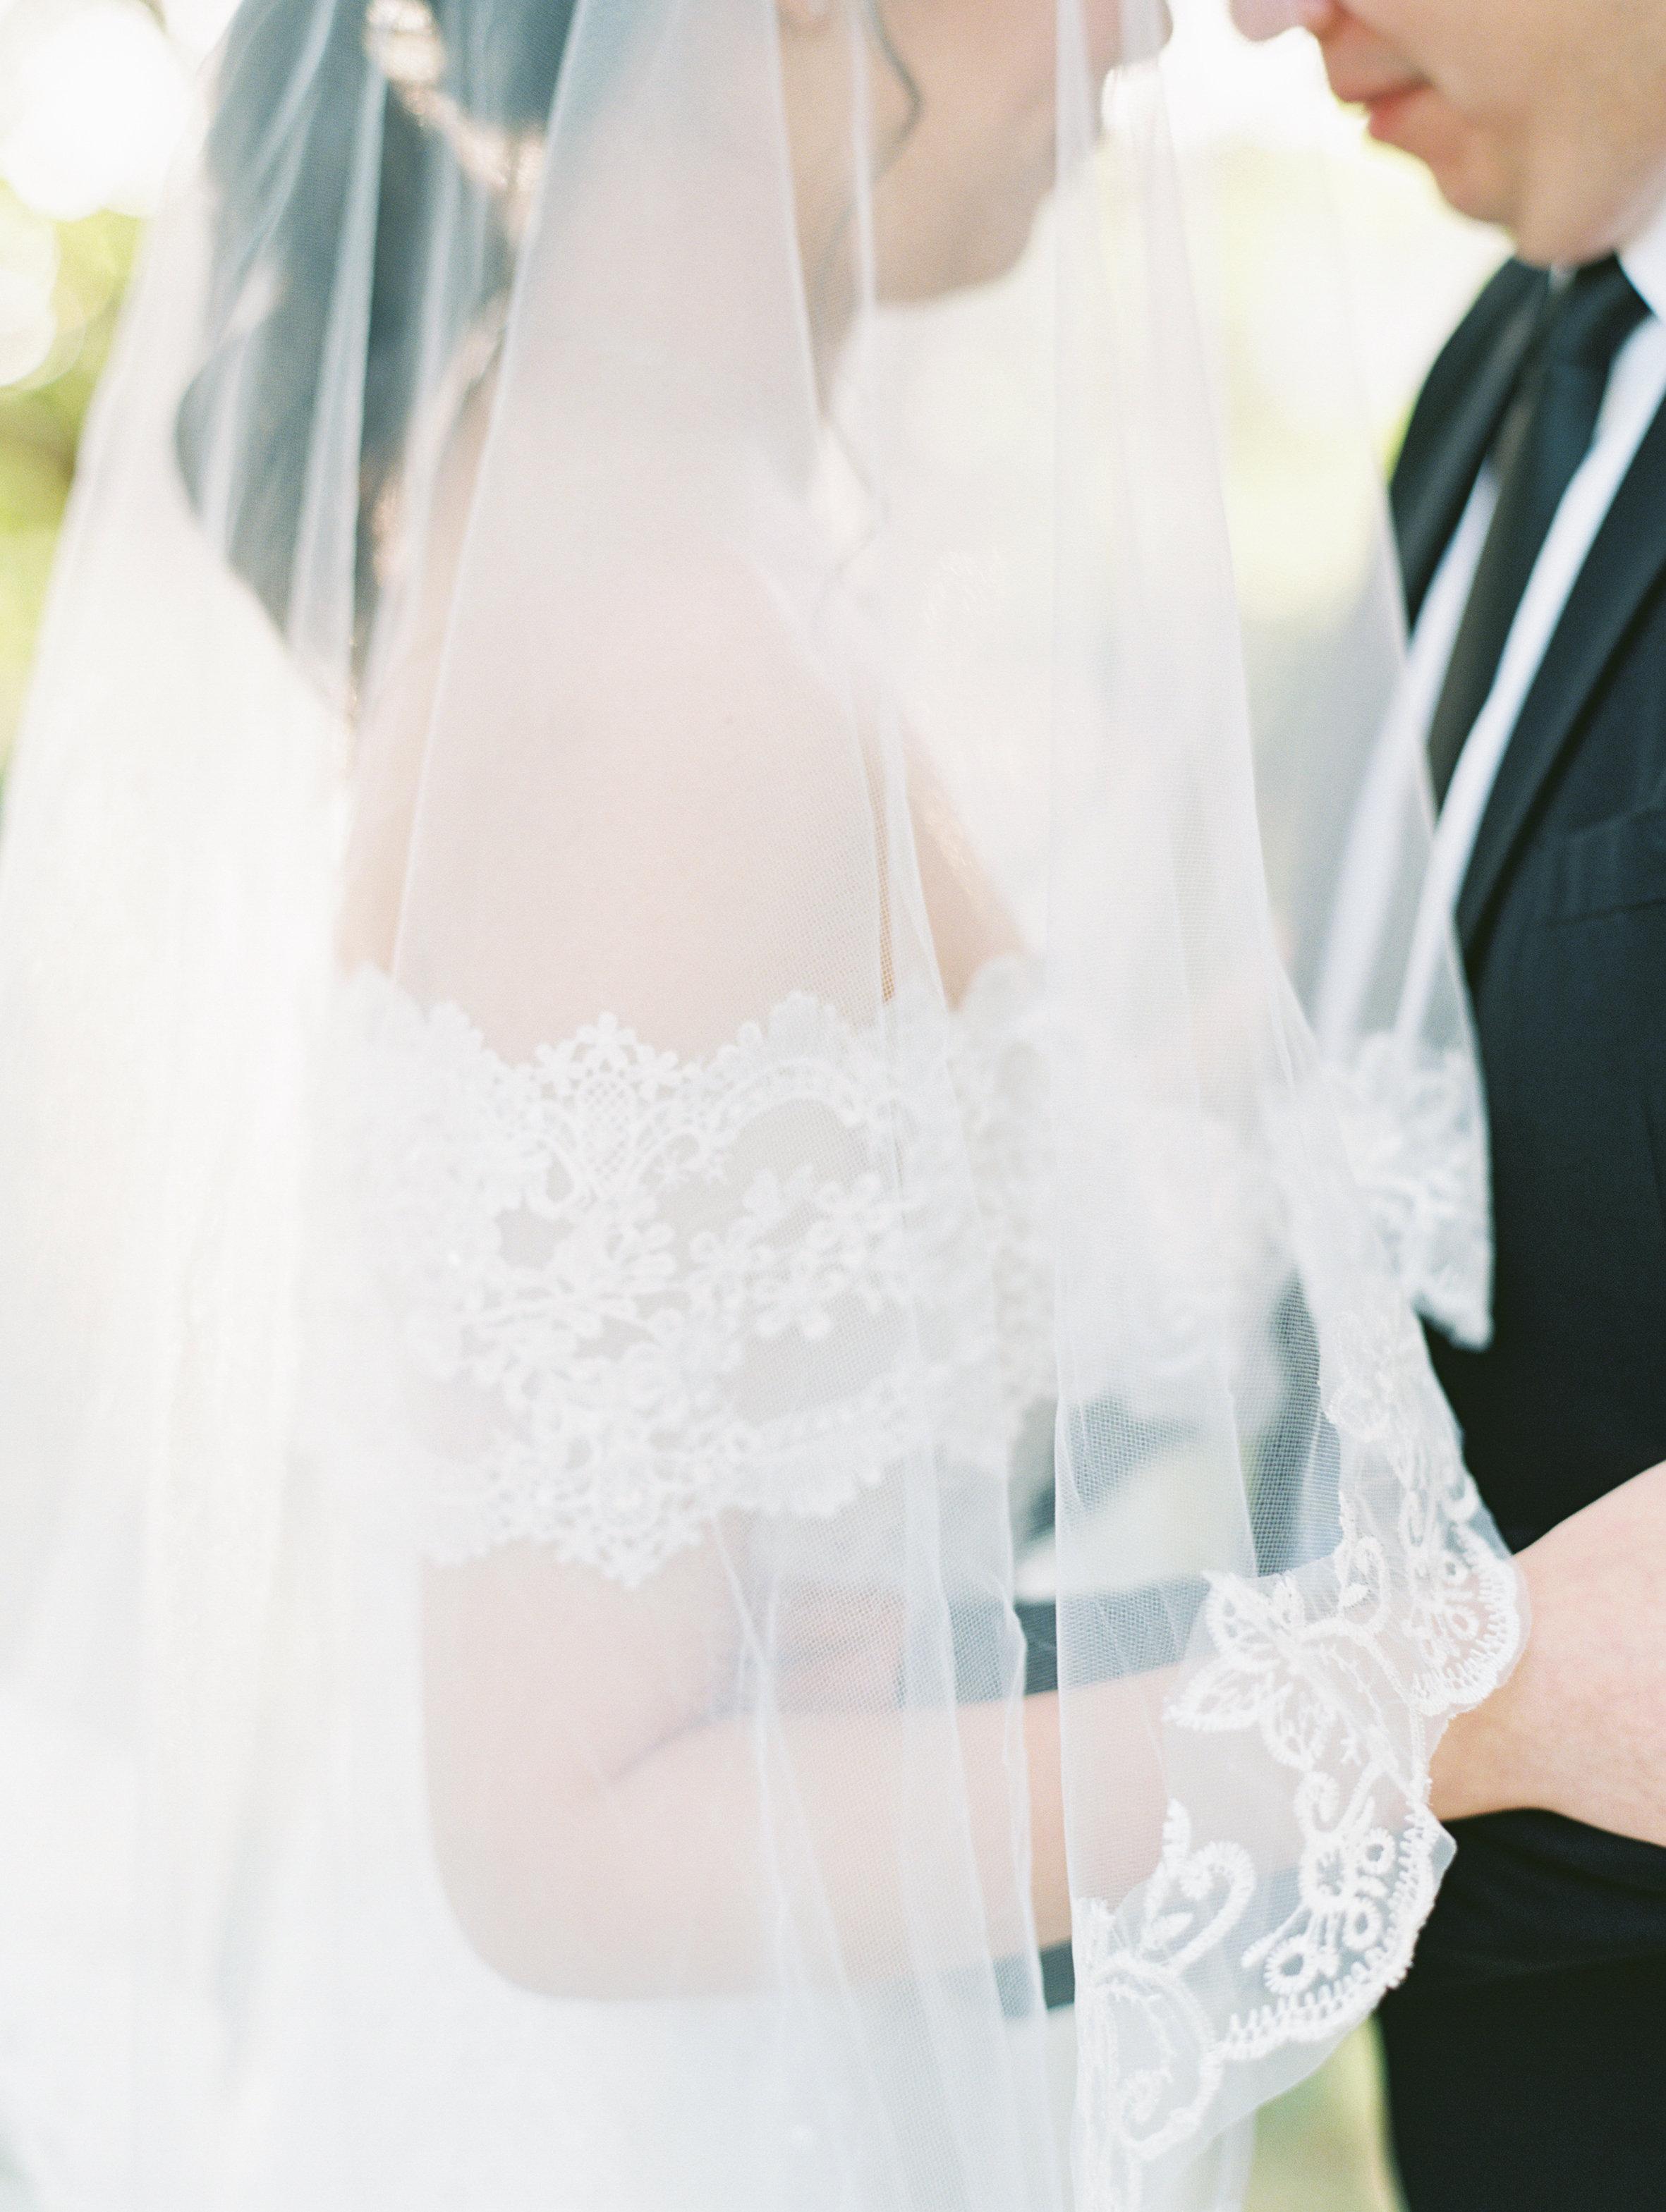 santa-barbara-elopement-wedding-planner-planning-coordinator-coordination-event-design-villa-verano-estate-riviera-garden-olive-tree-asian-day-of-palm-tree (12).jpg